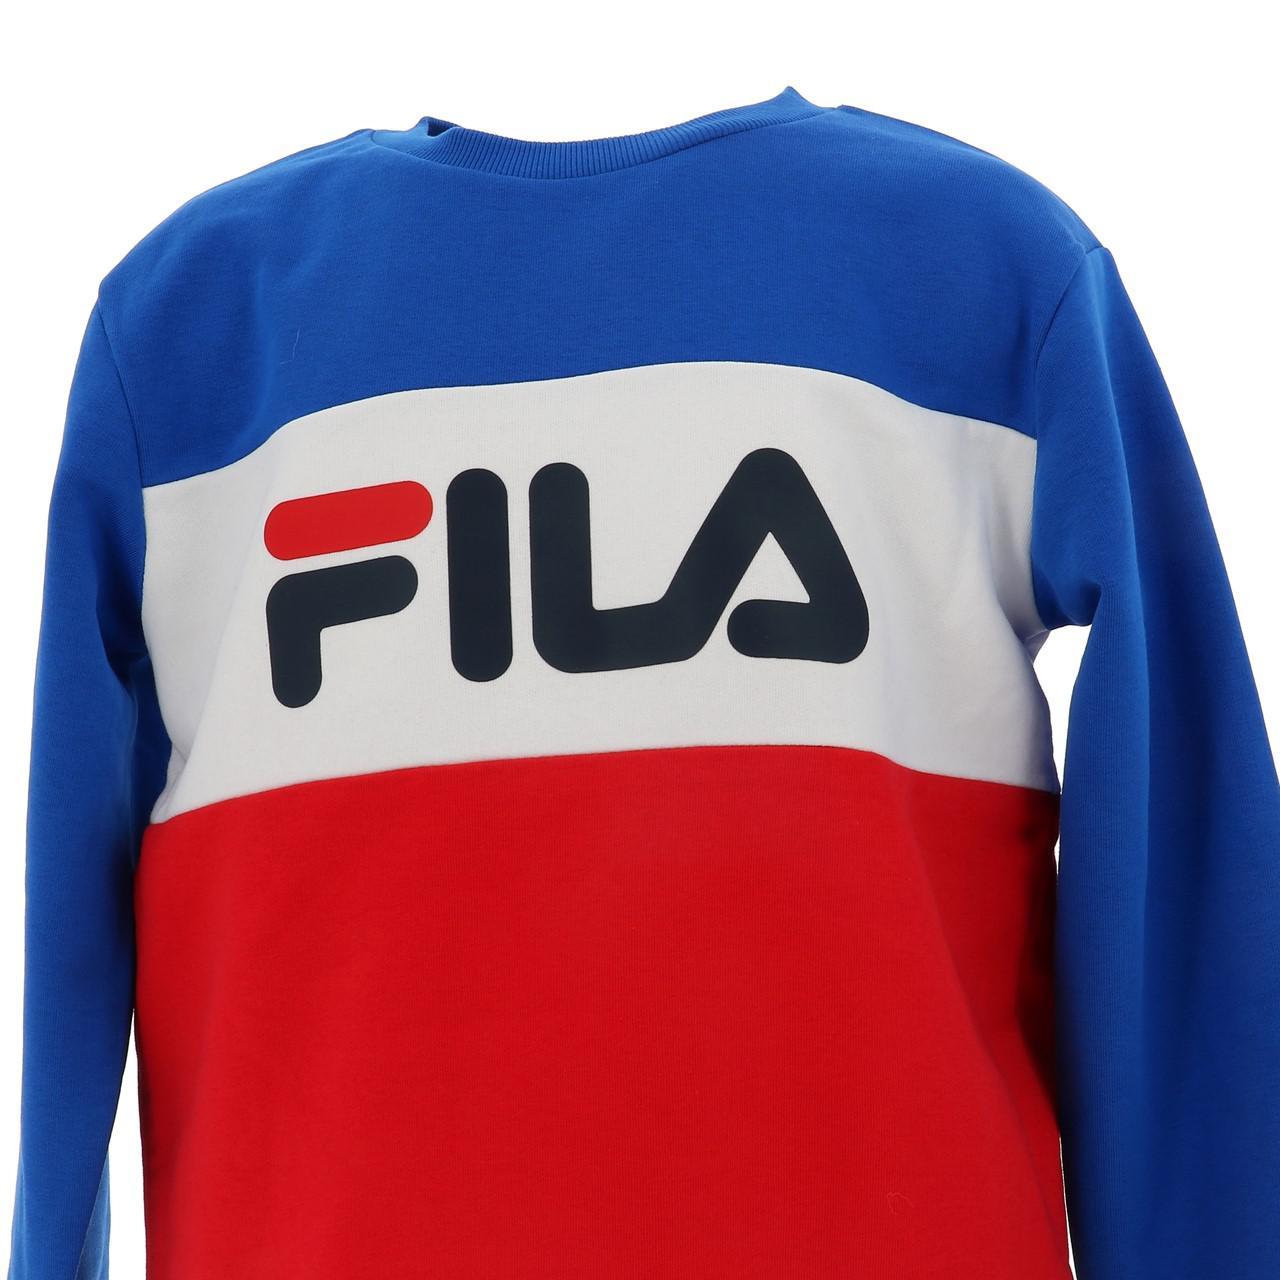 Sweatshirt-Fila-Nacht-Blockiert-Jr-Roy-Rge-Blau-43025-Neu Indexbild 2